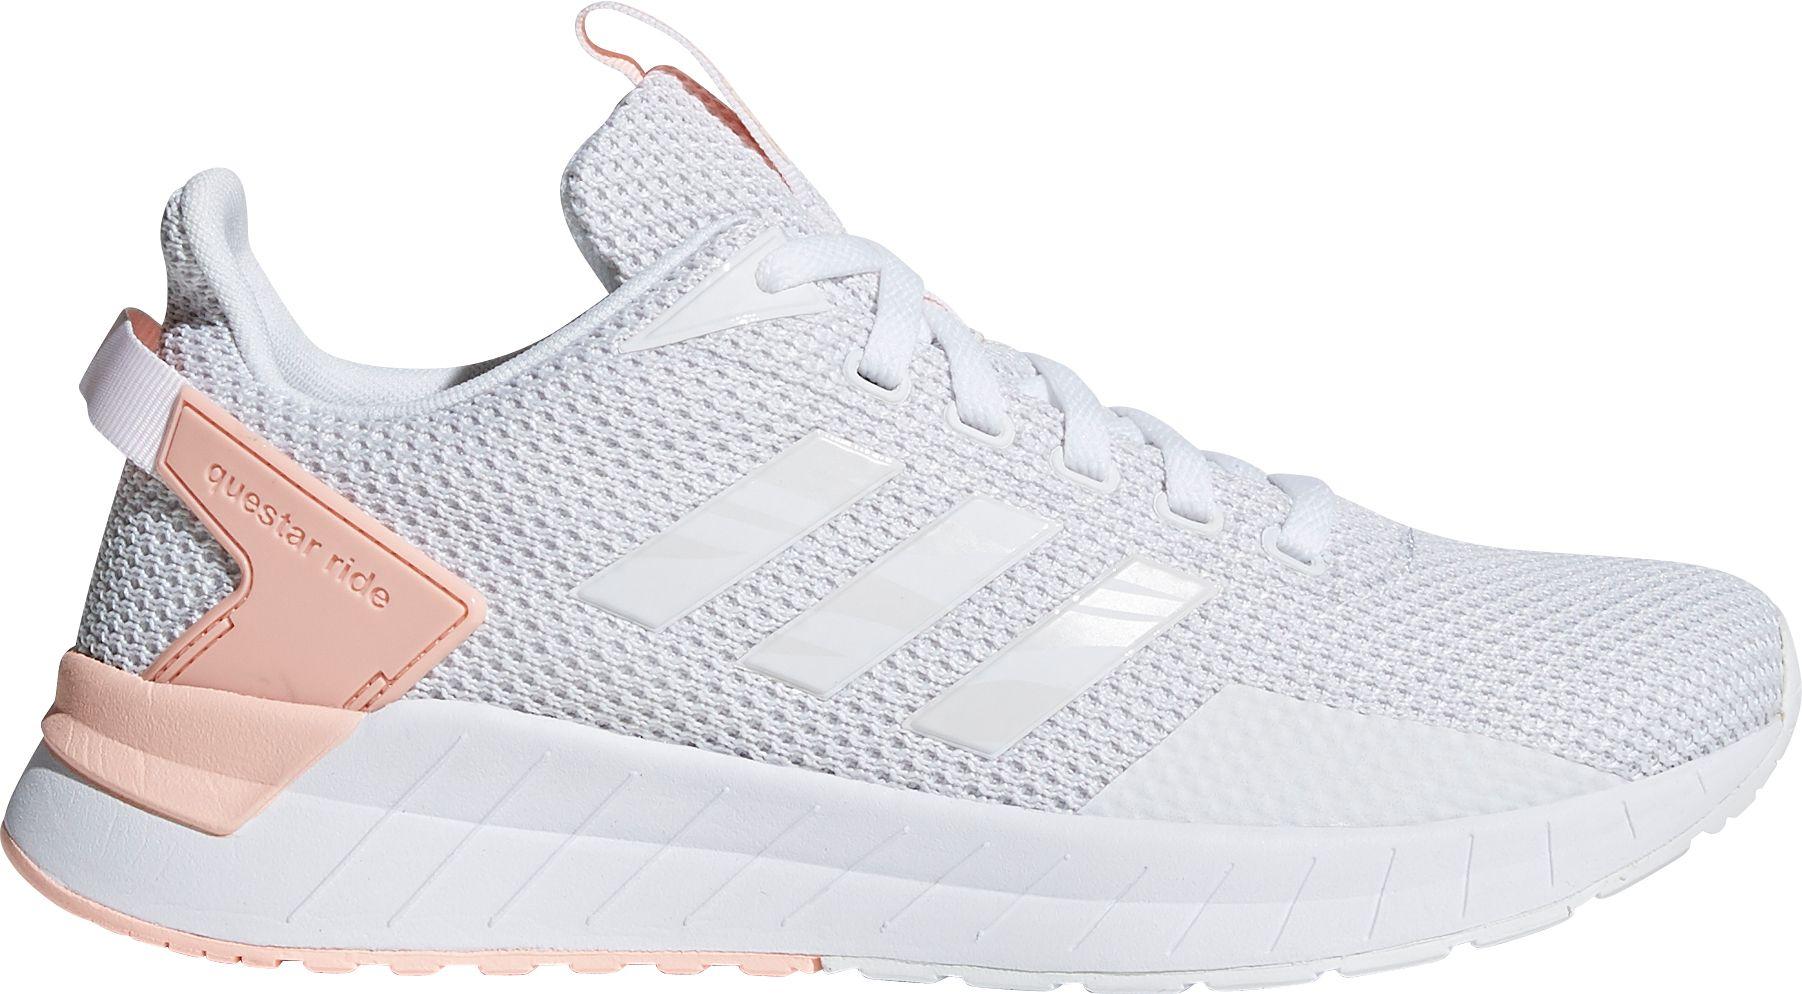 Zapatillas para correr adidas correr Questar | Ride para para mujer | acc3396 - sfitness.xyz